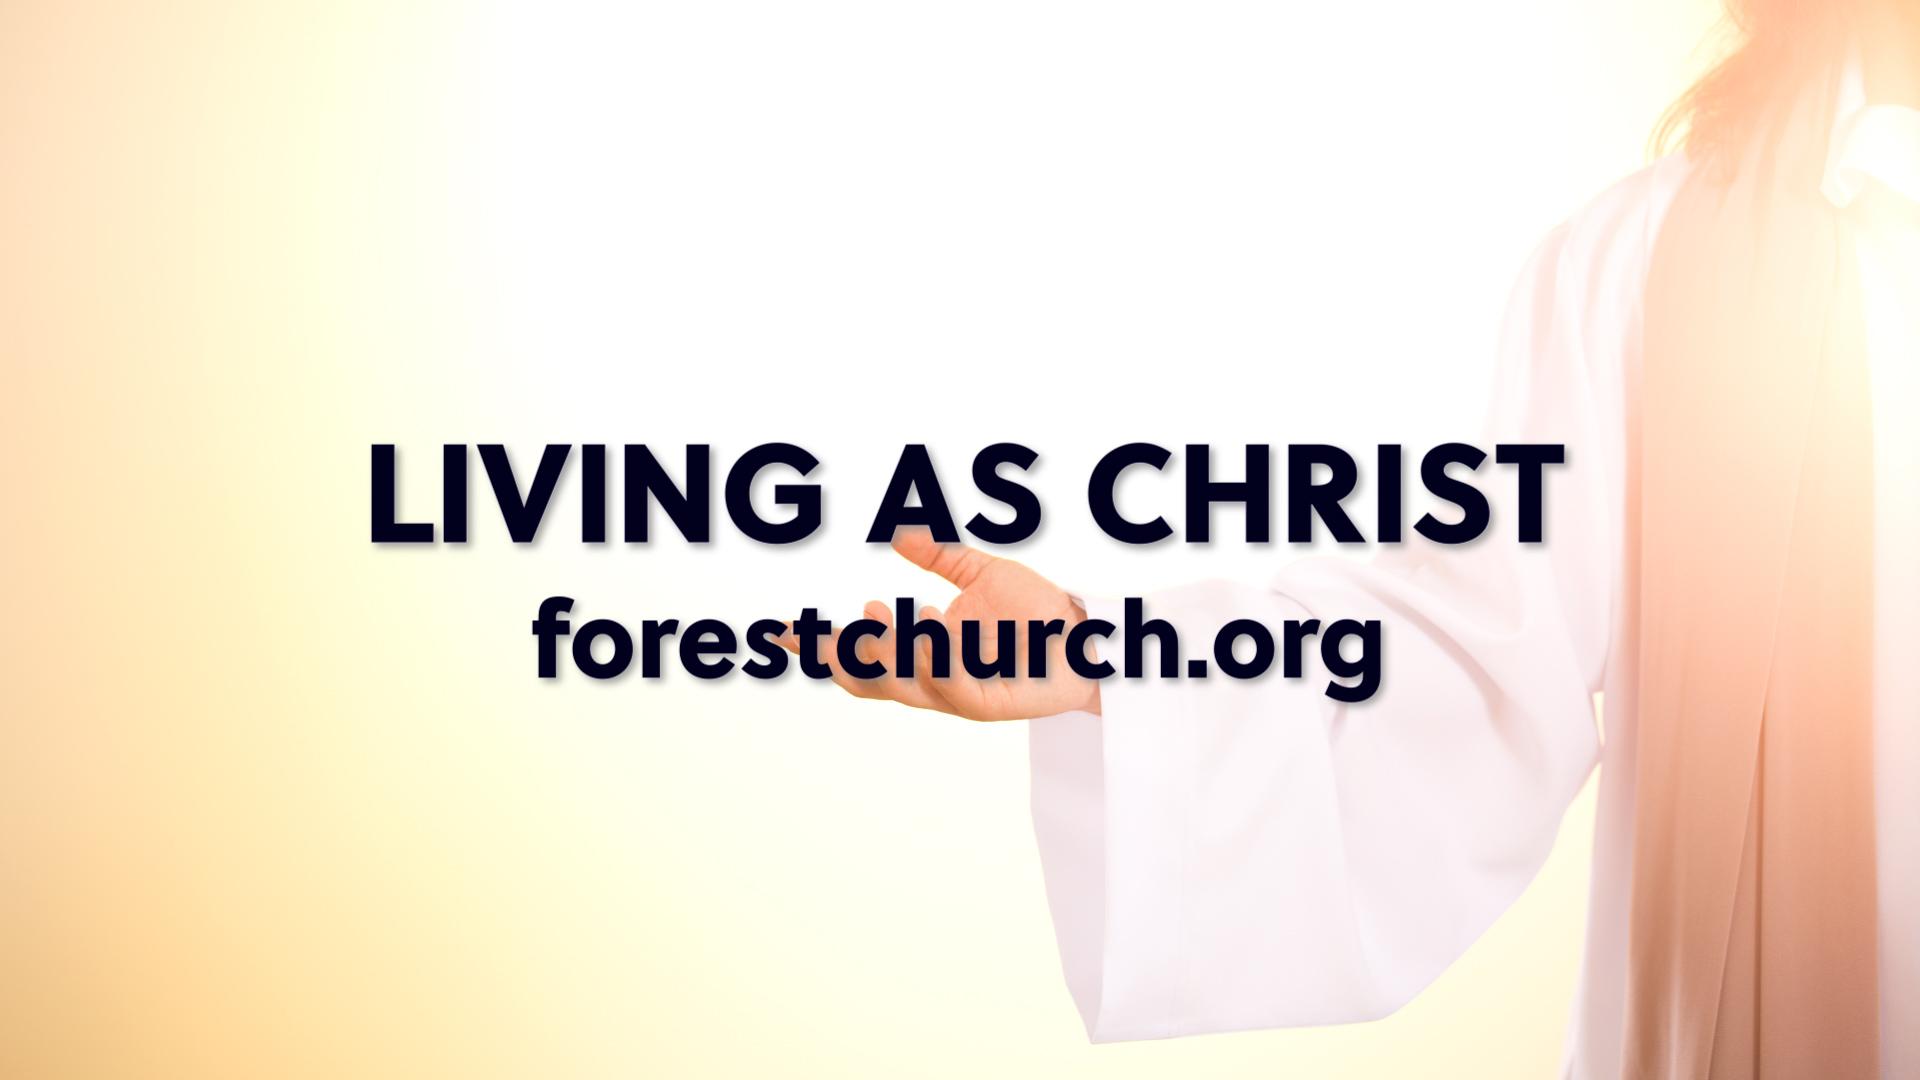 Living as Christ